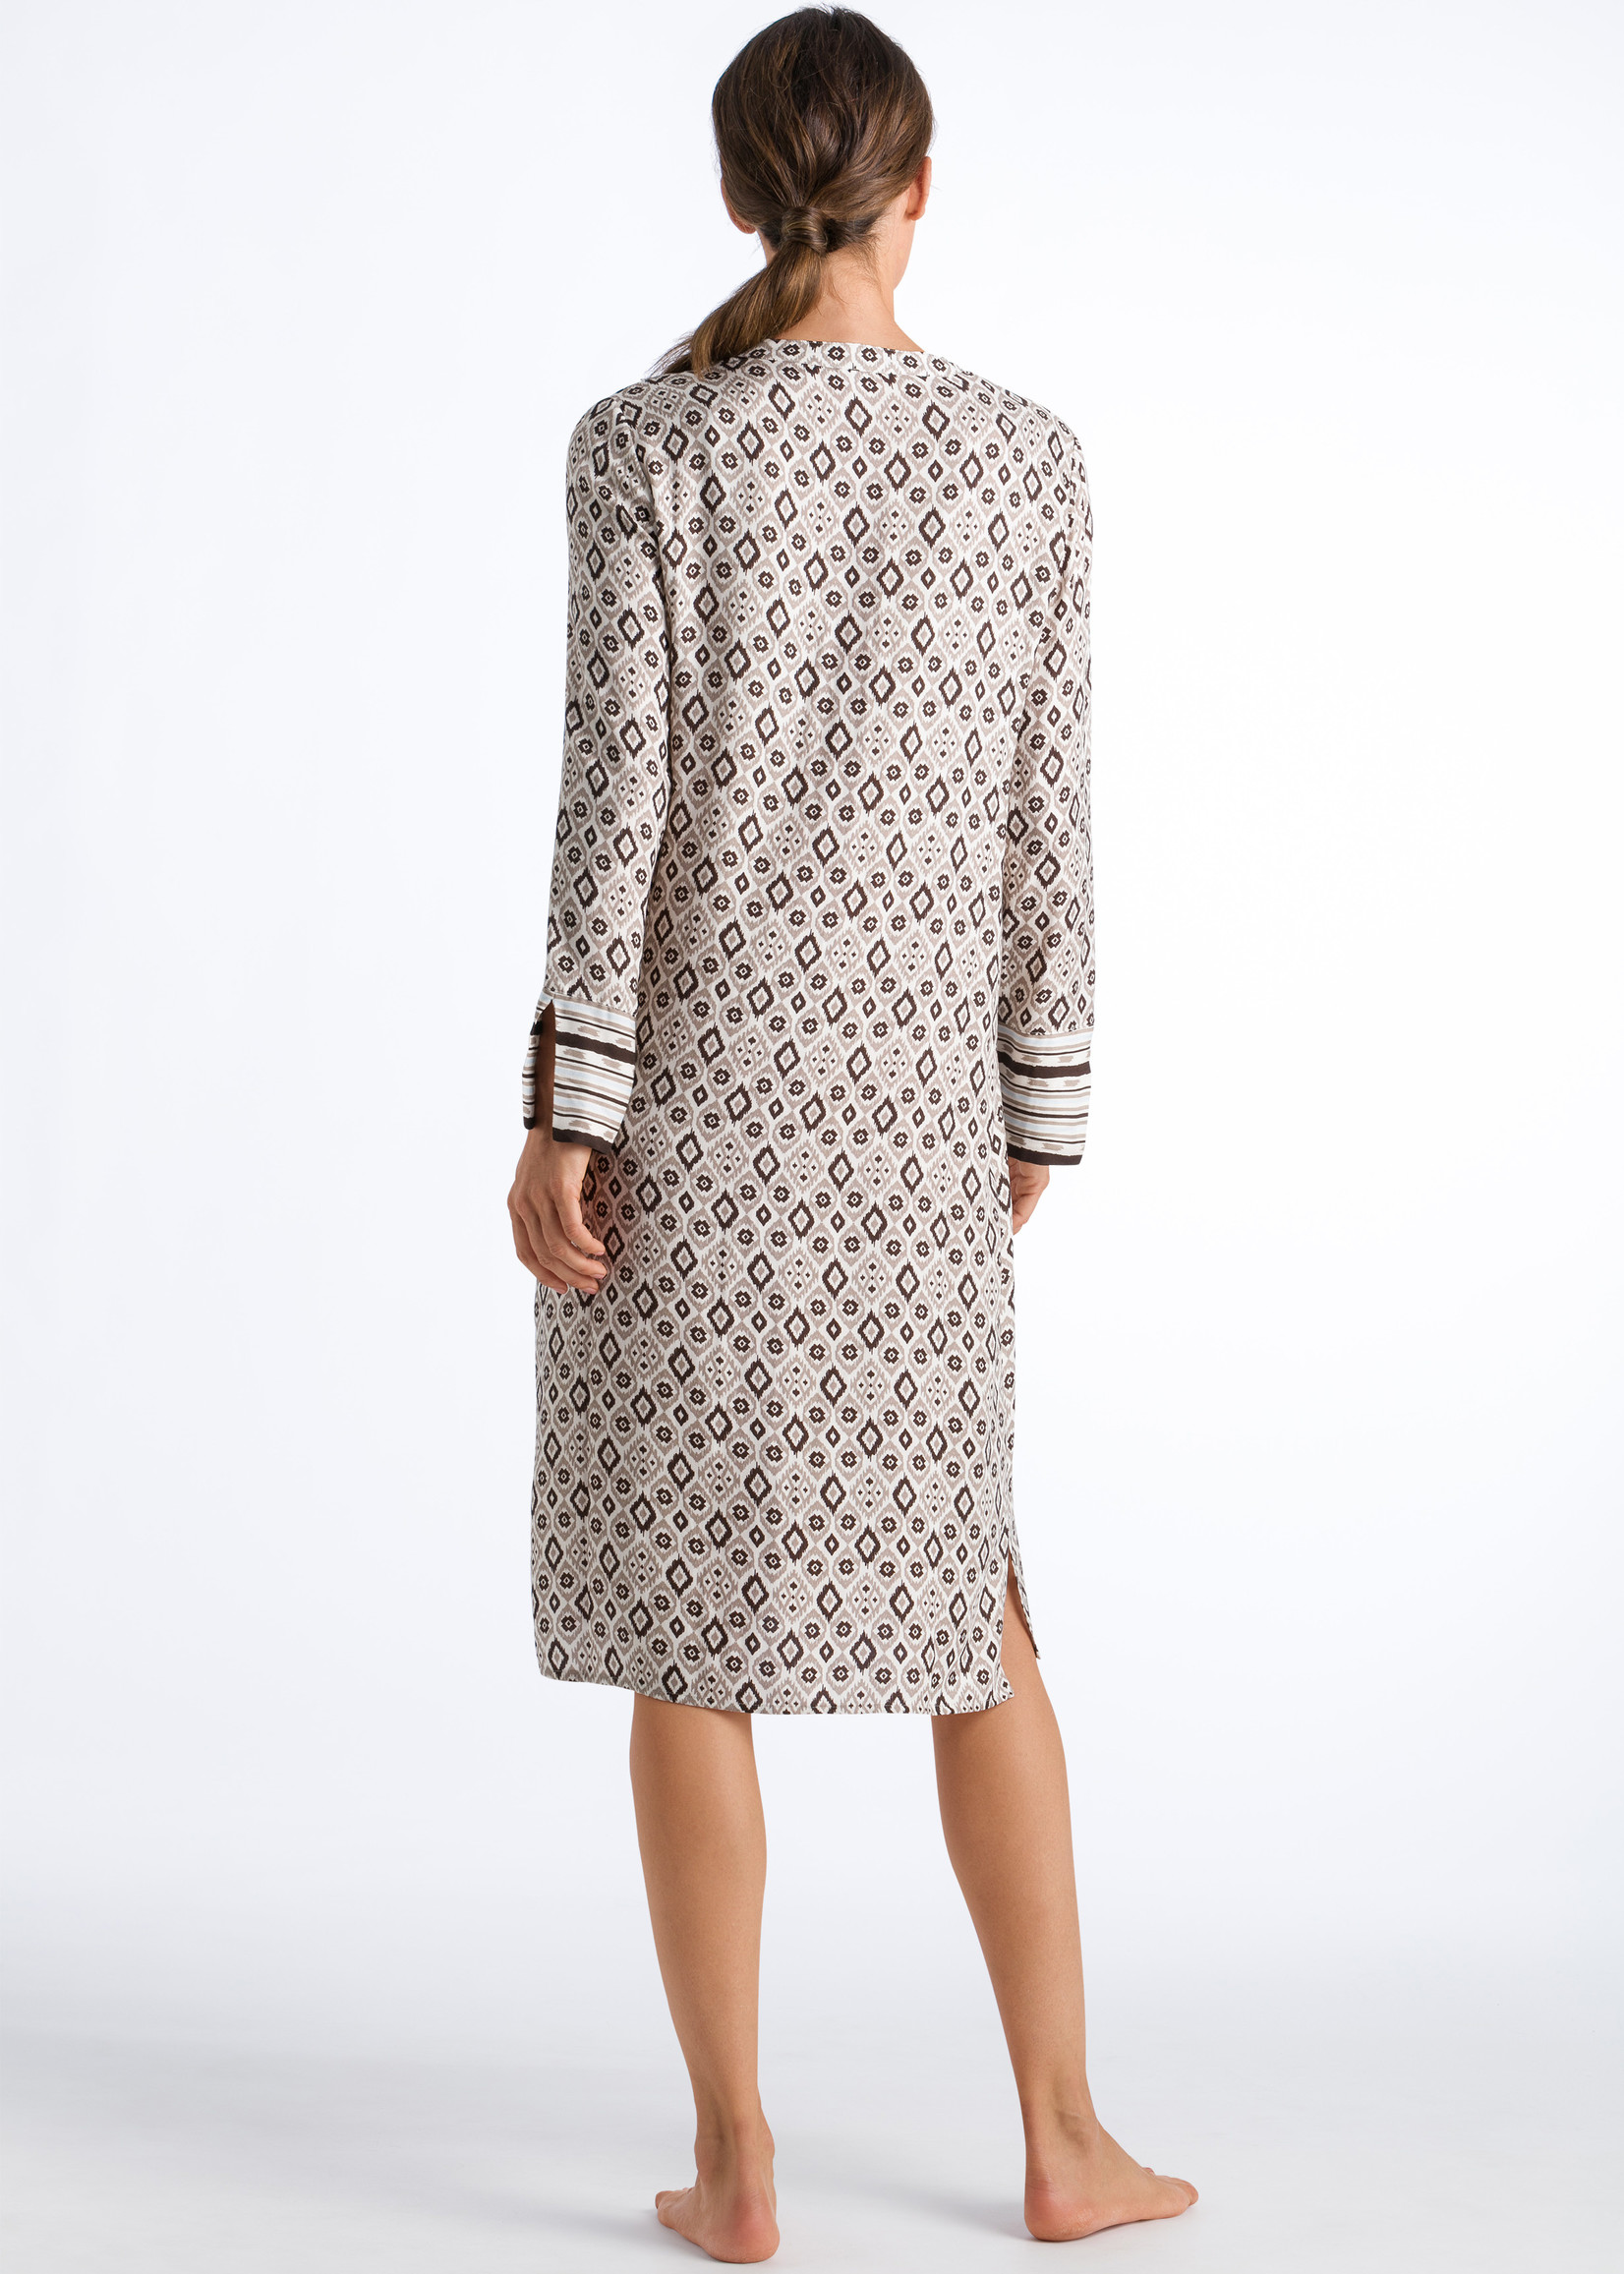 Hanro Favourites Dress